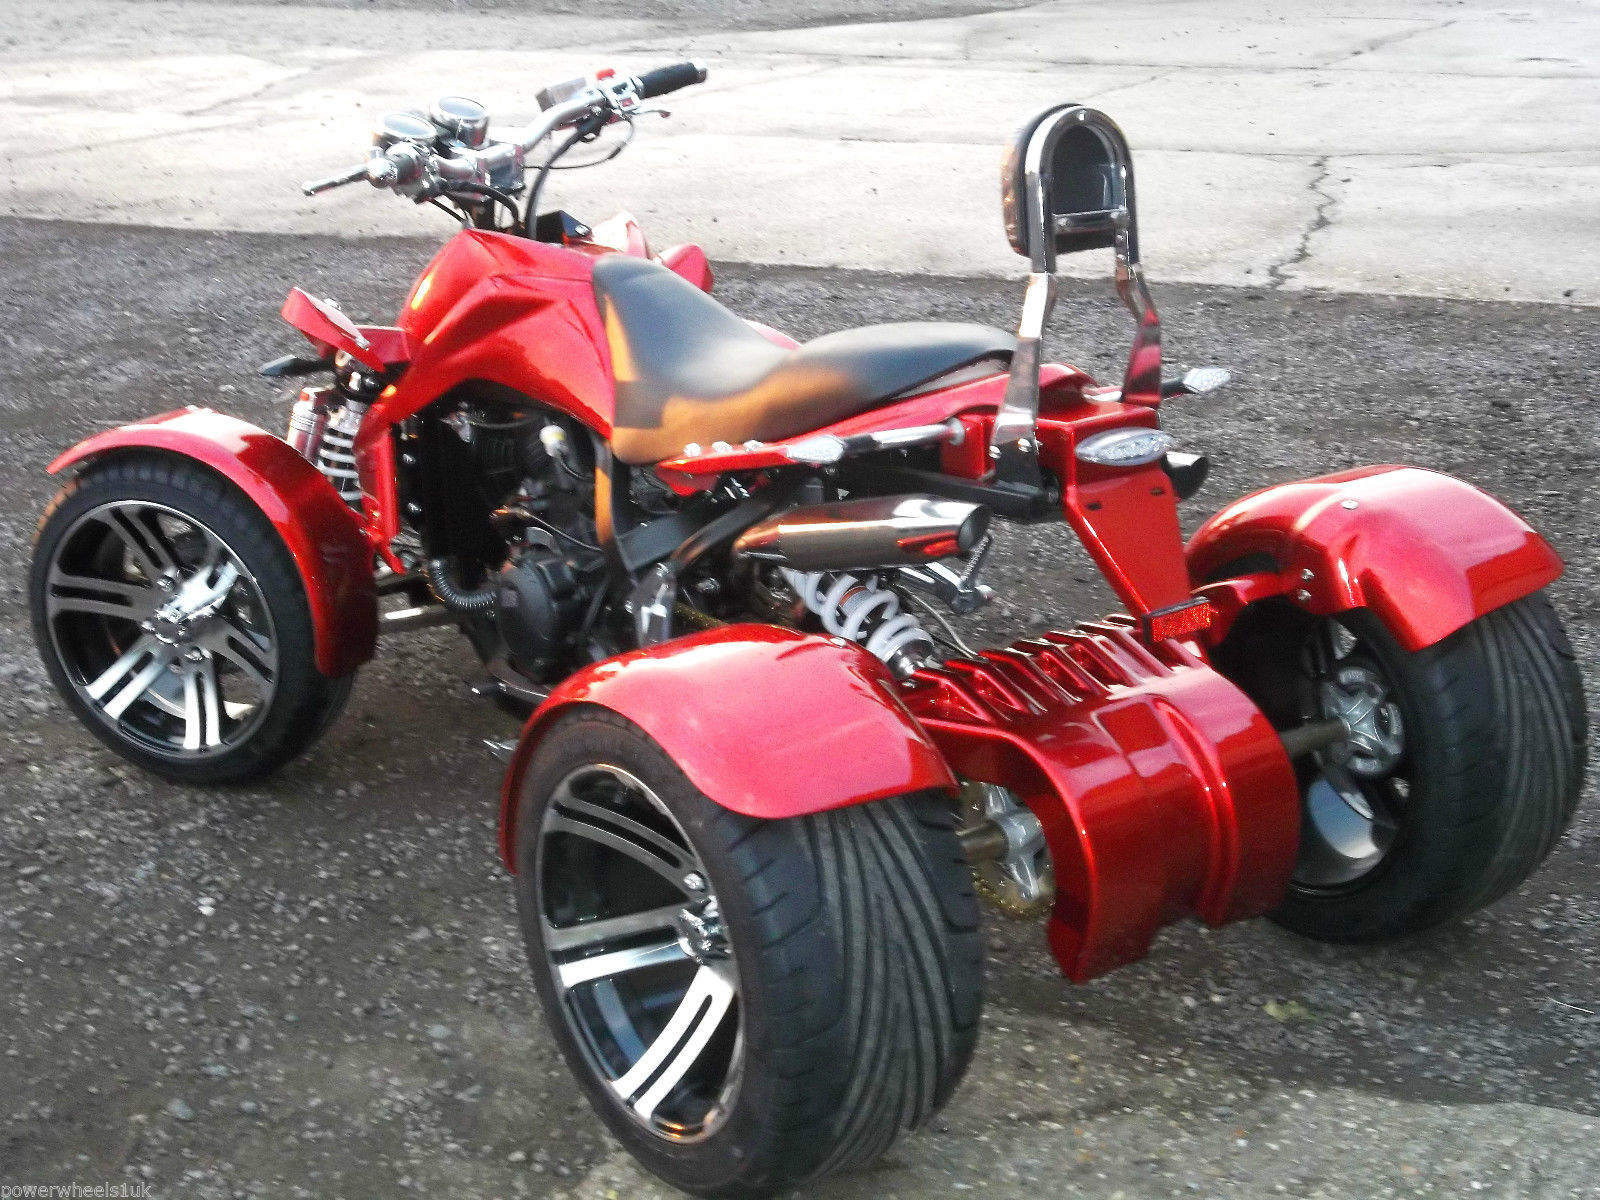 spy racing 350cc f1 road legal quad bike brand new 2014 un registered. Black Bedroom Furniture Sets. Home Design Ideas